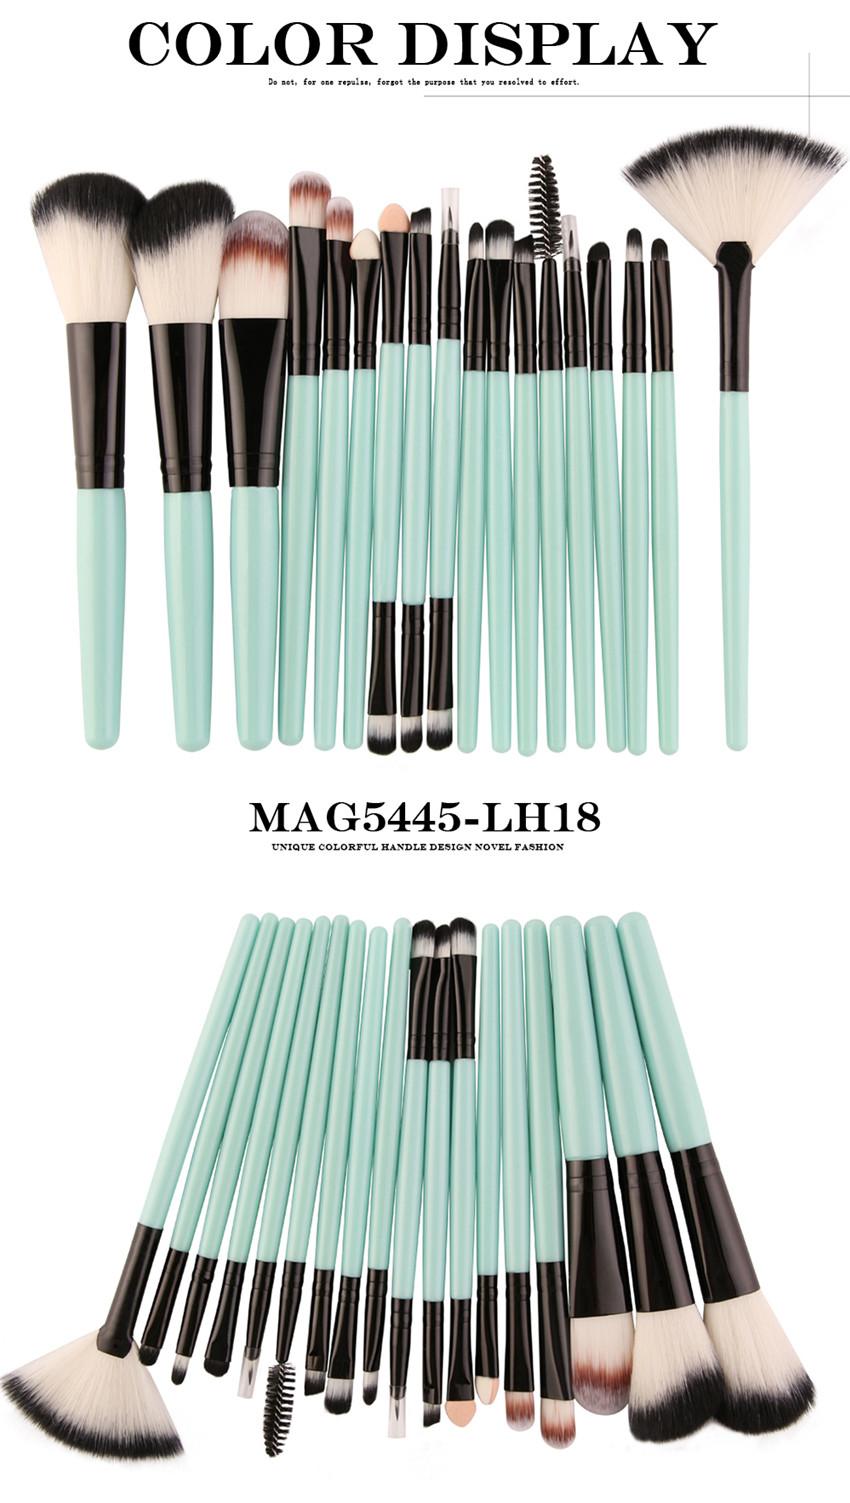 18Pcs/lot Brand Brushes Makeup Brush Set maquiagem Cosmetics Power Foundation Blush Eye Shadow Blending Fan Make Up Kits Beauty 11